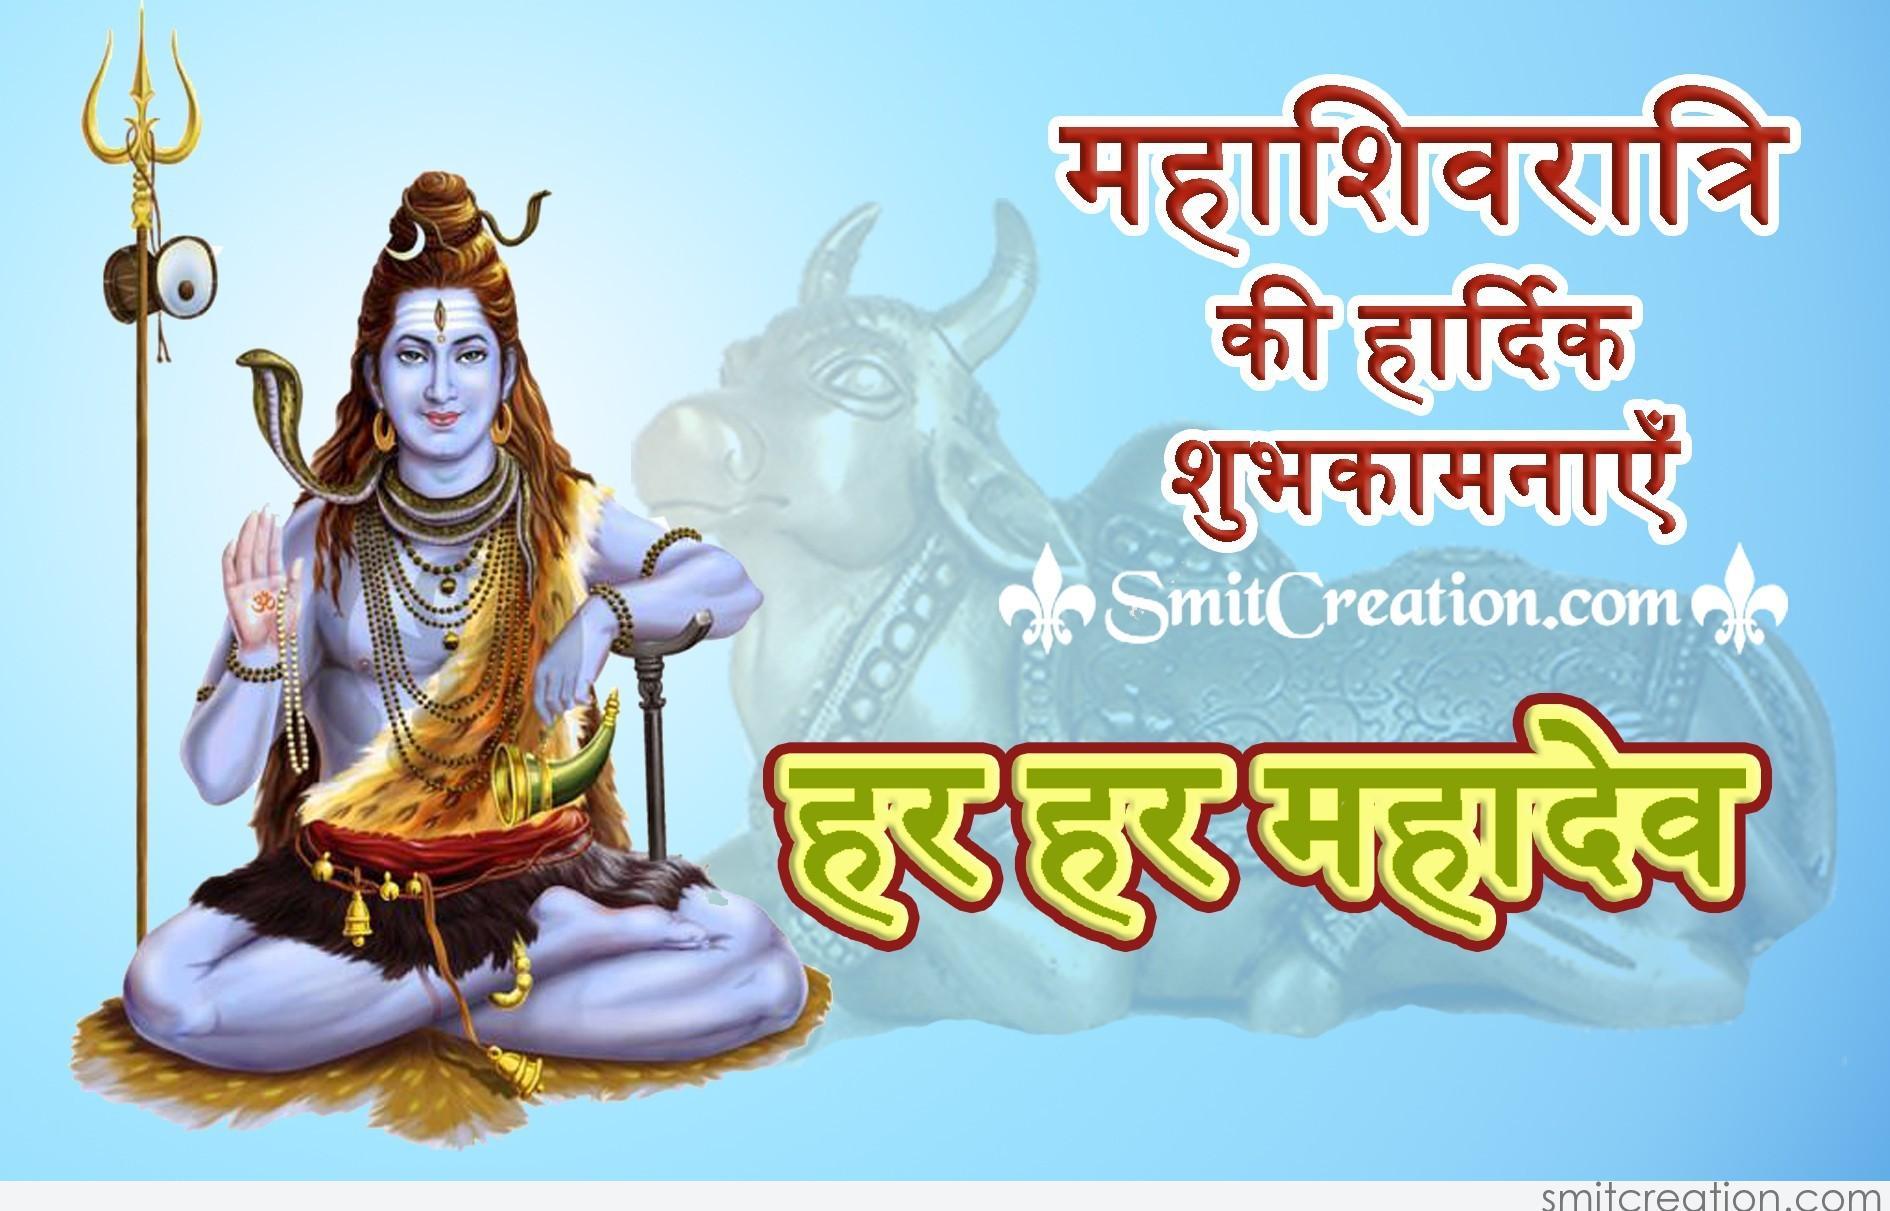 Har har mahadev maha shivratri ki hardik shubhkamnaye download image m4hsunfo